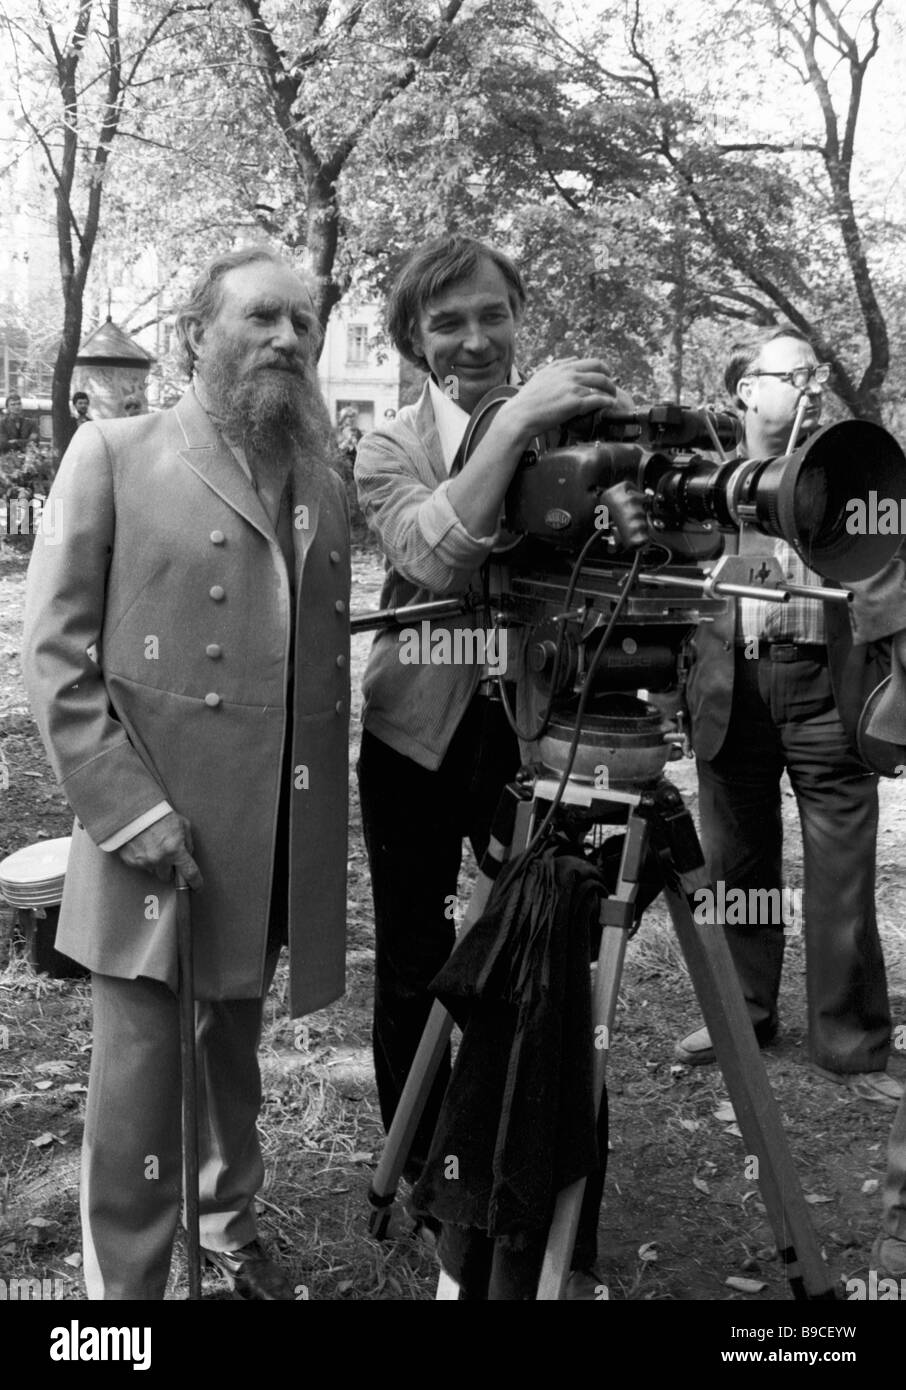 Film soviétique Sergueï Guerassimov 19061985 cameraman et Sergei Filippov tir droit le film Léon Photo Stock